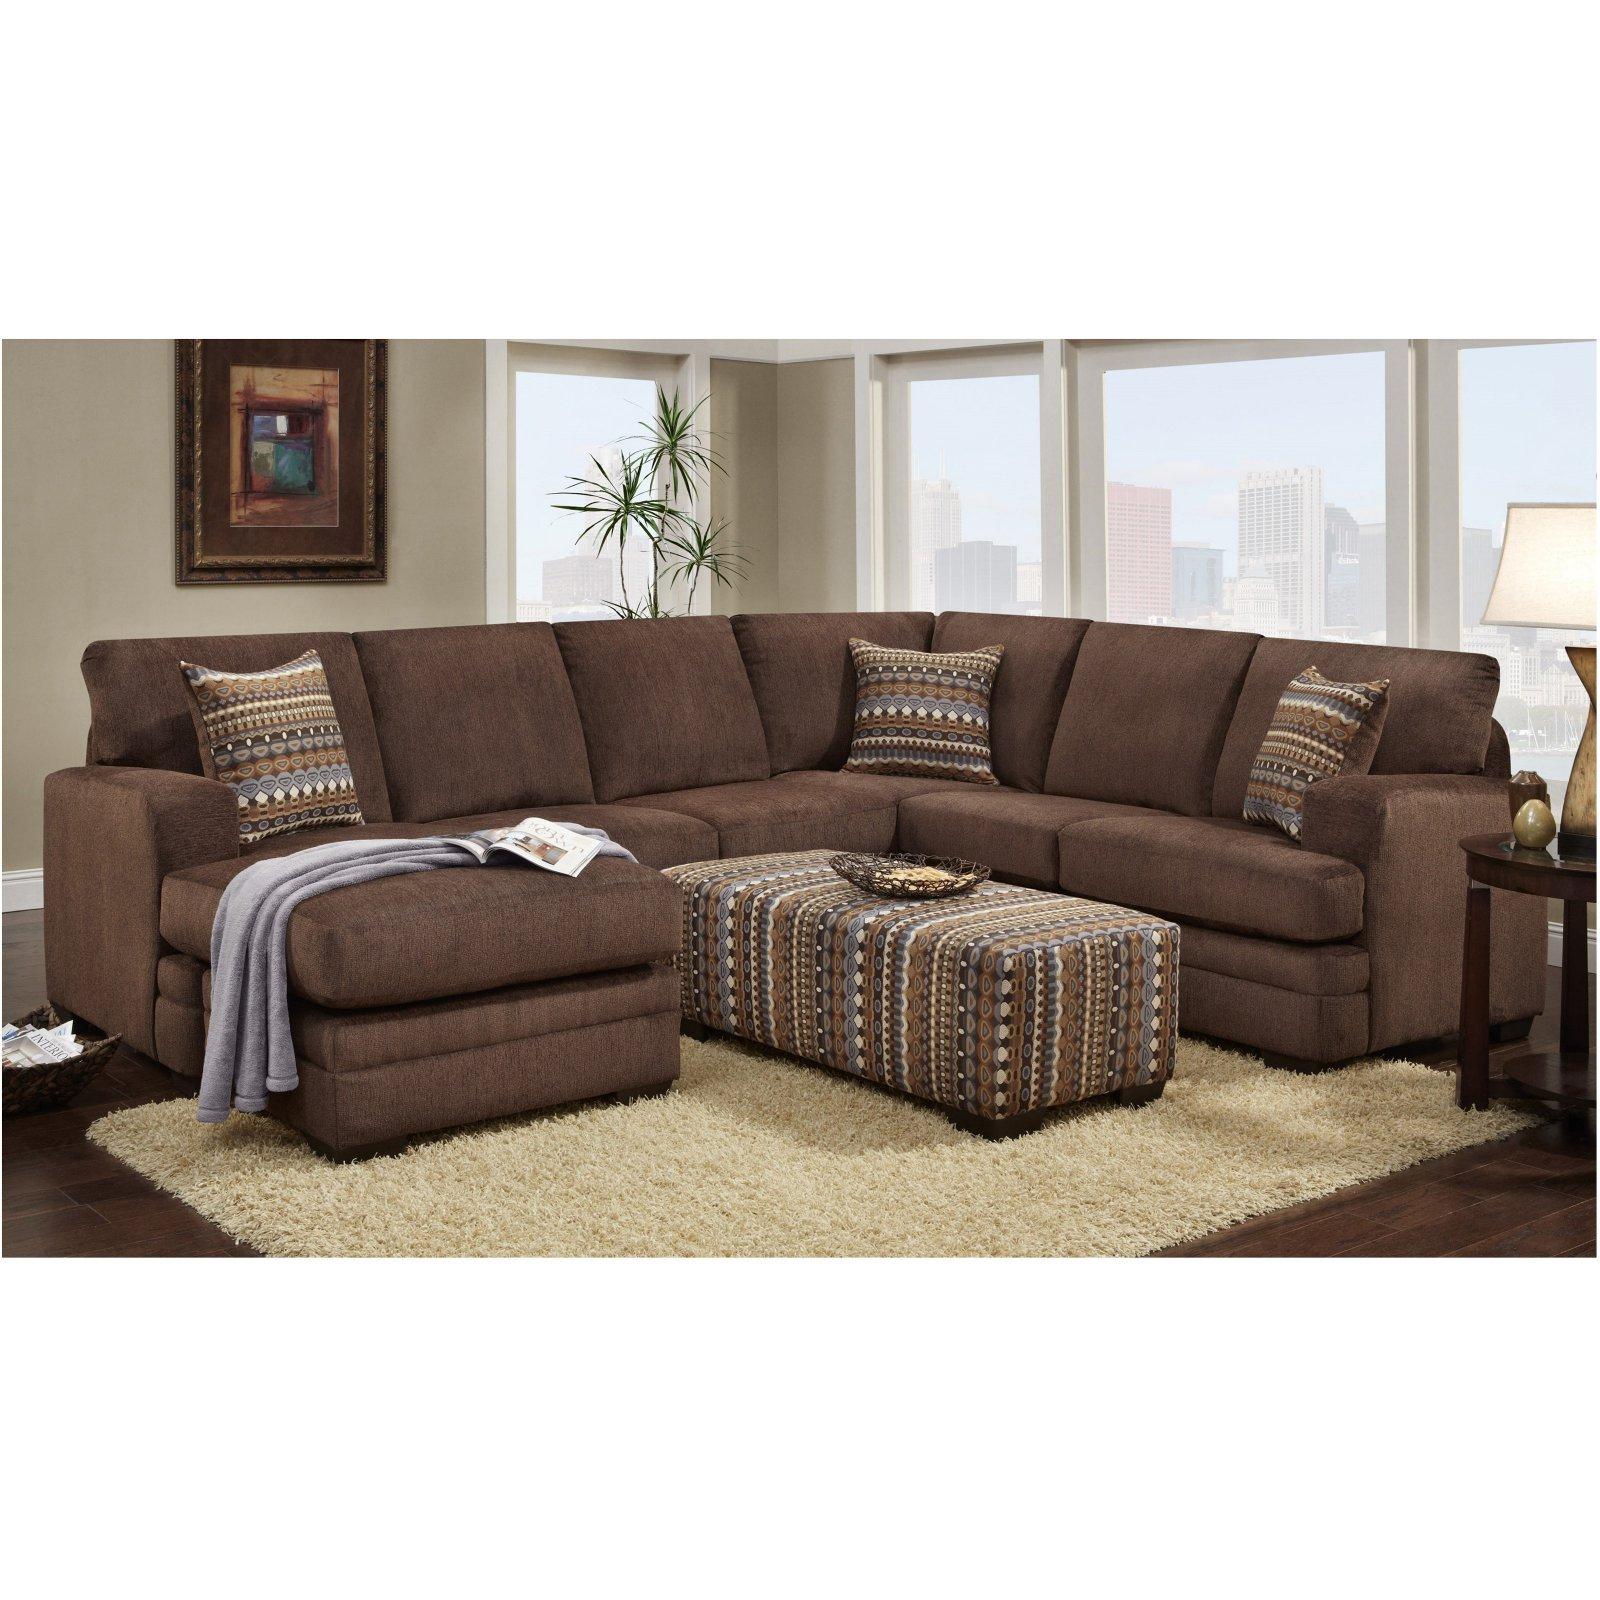 Chelsea Home Furniture Northborough Sectional Sofa